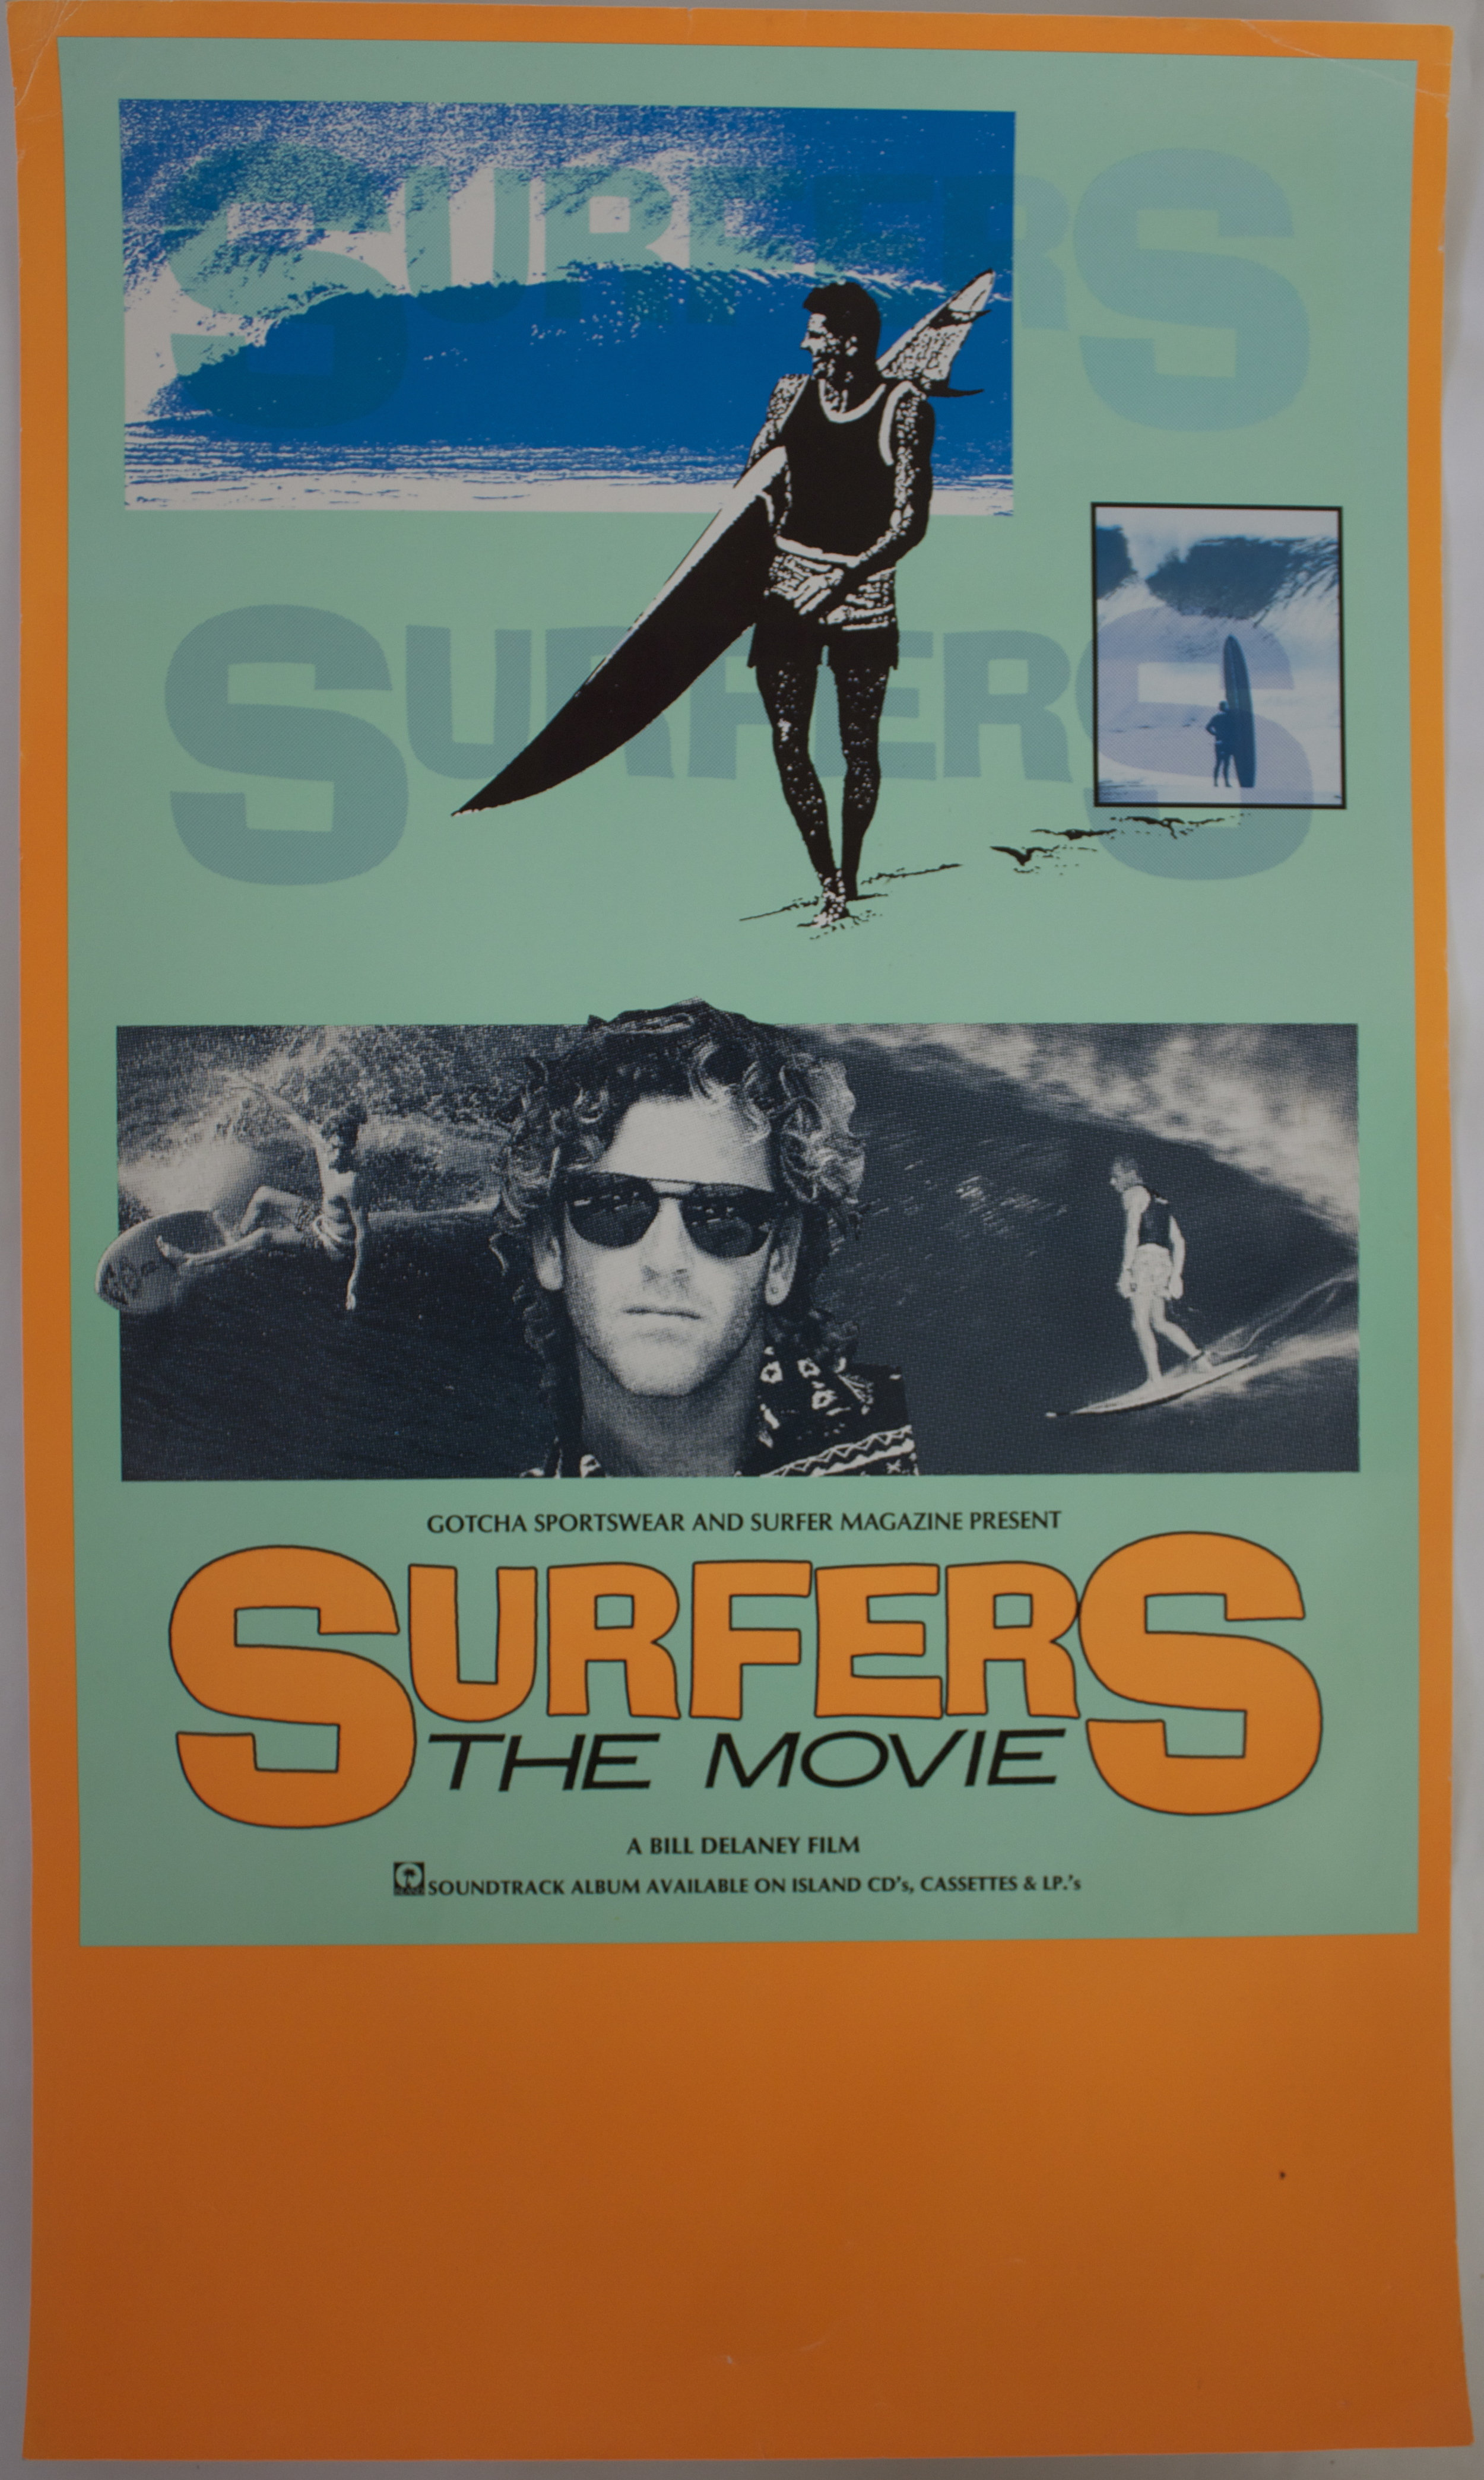 LOT 88 surfers movie  - copie.jpg